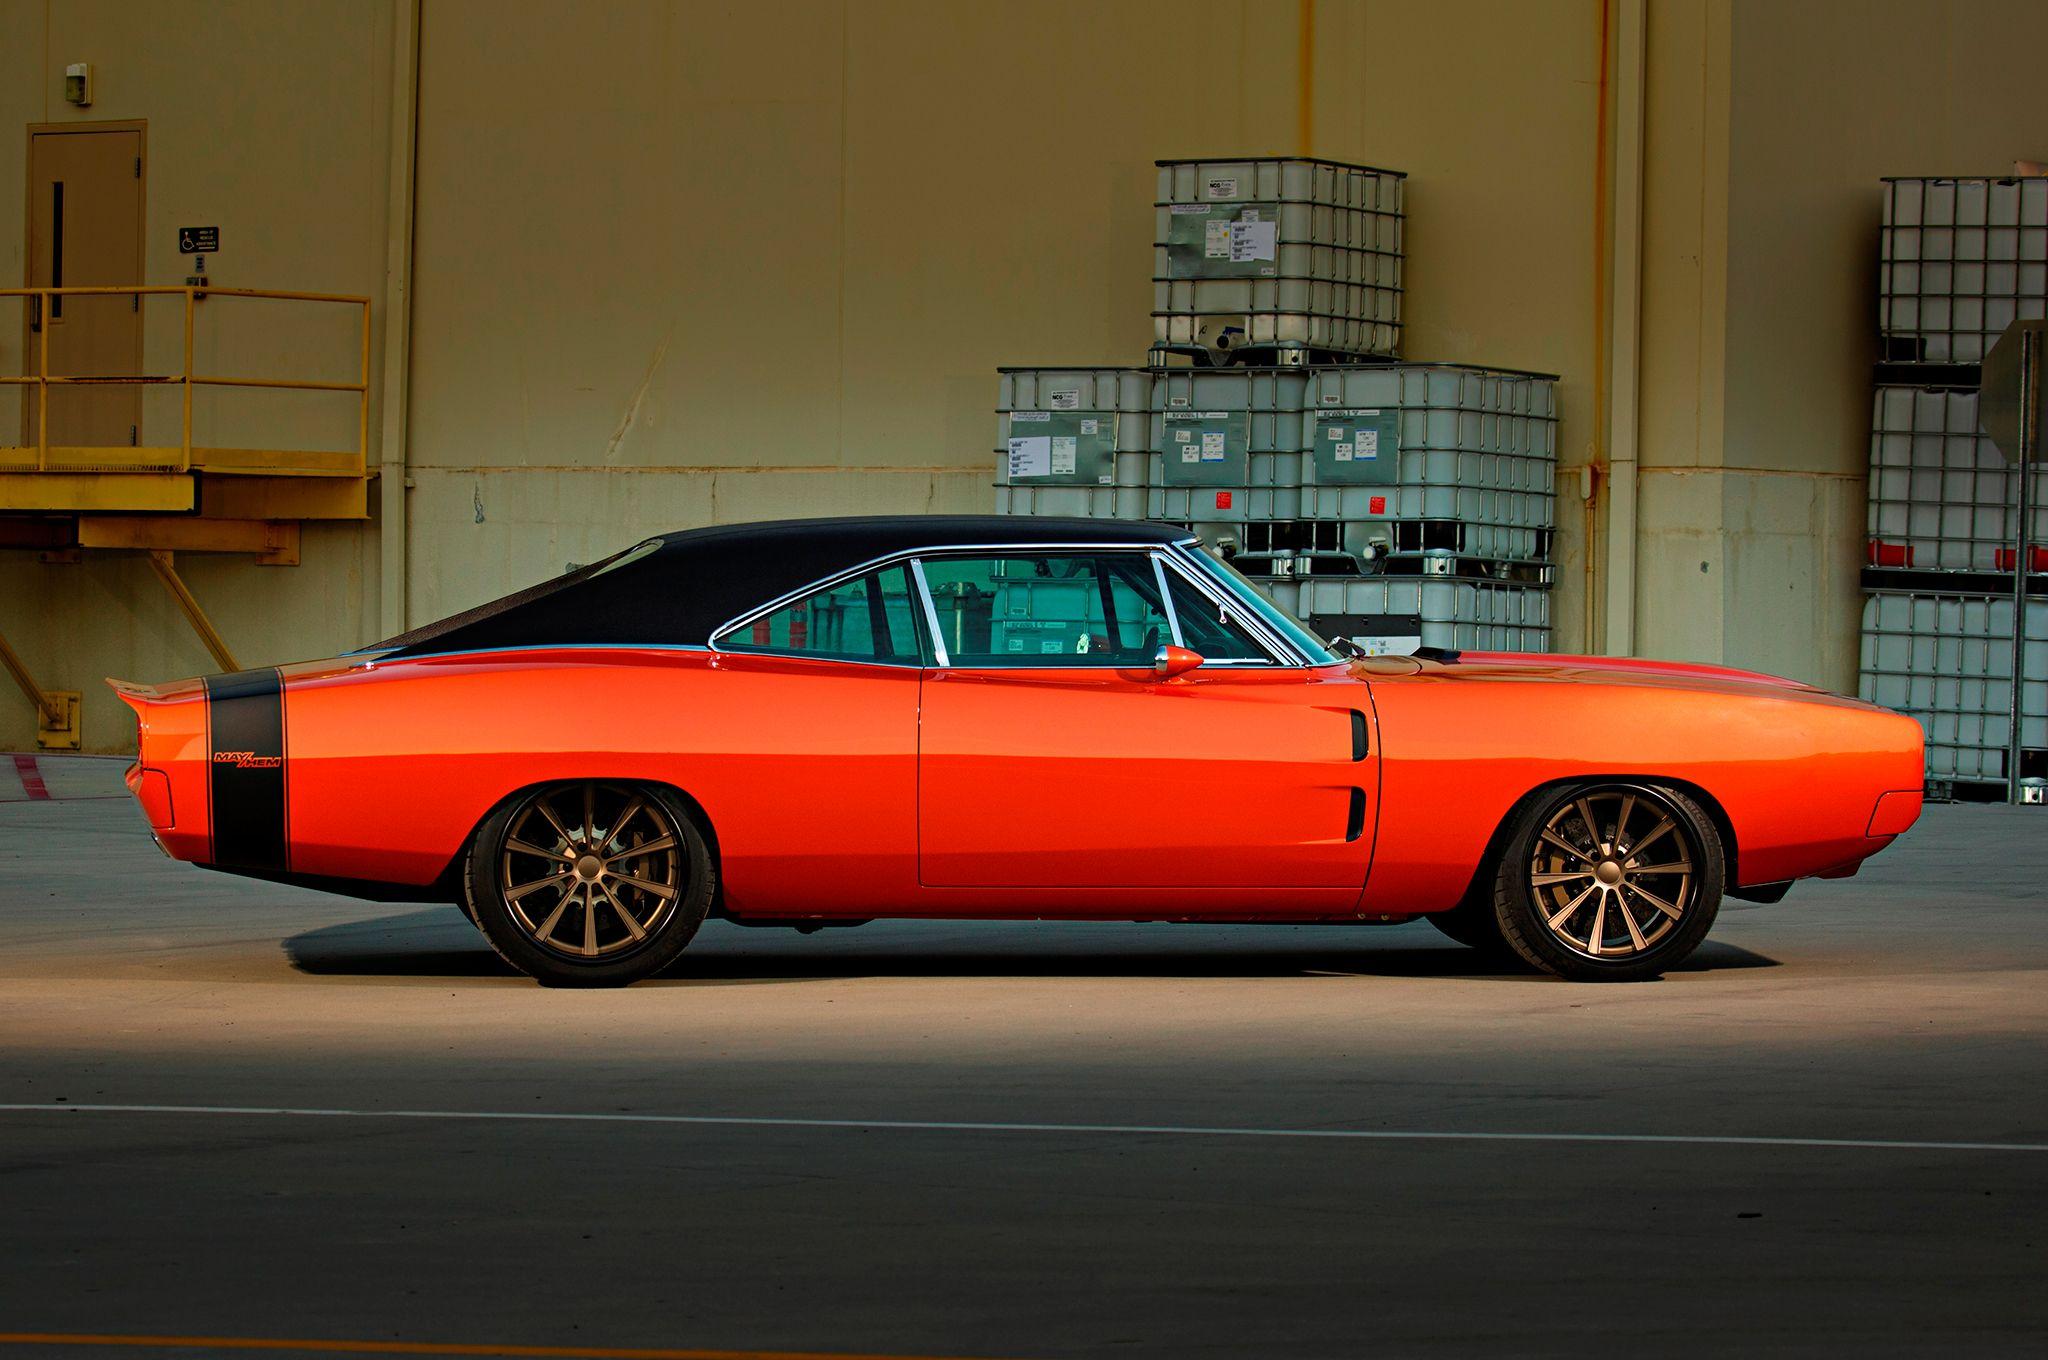 camaro experts build coolest car ever a 1969 dodge charger hot rod network cars. Black Bedroom Furniture Sets. Home Design Ideas